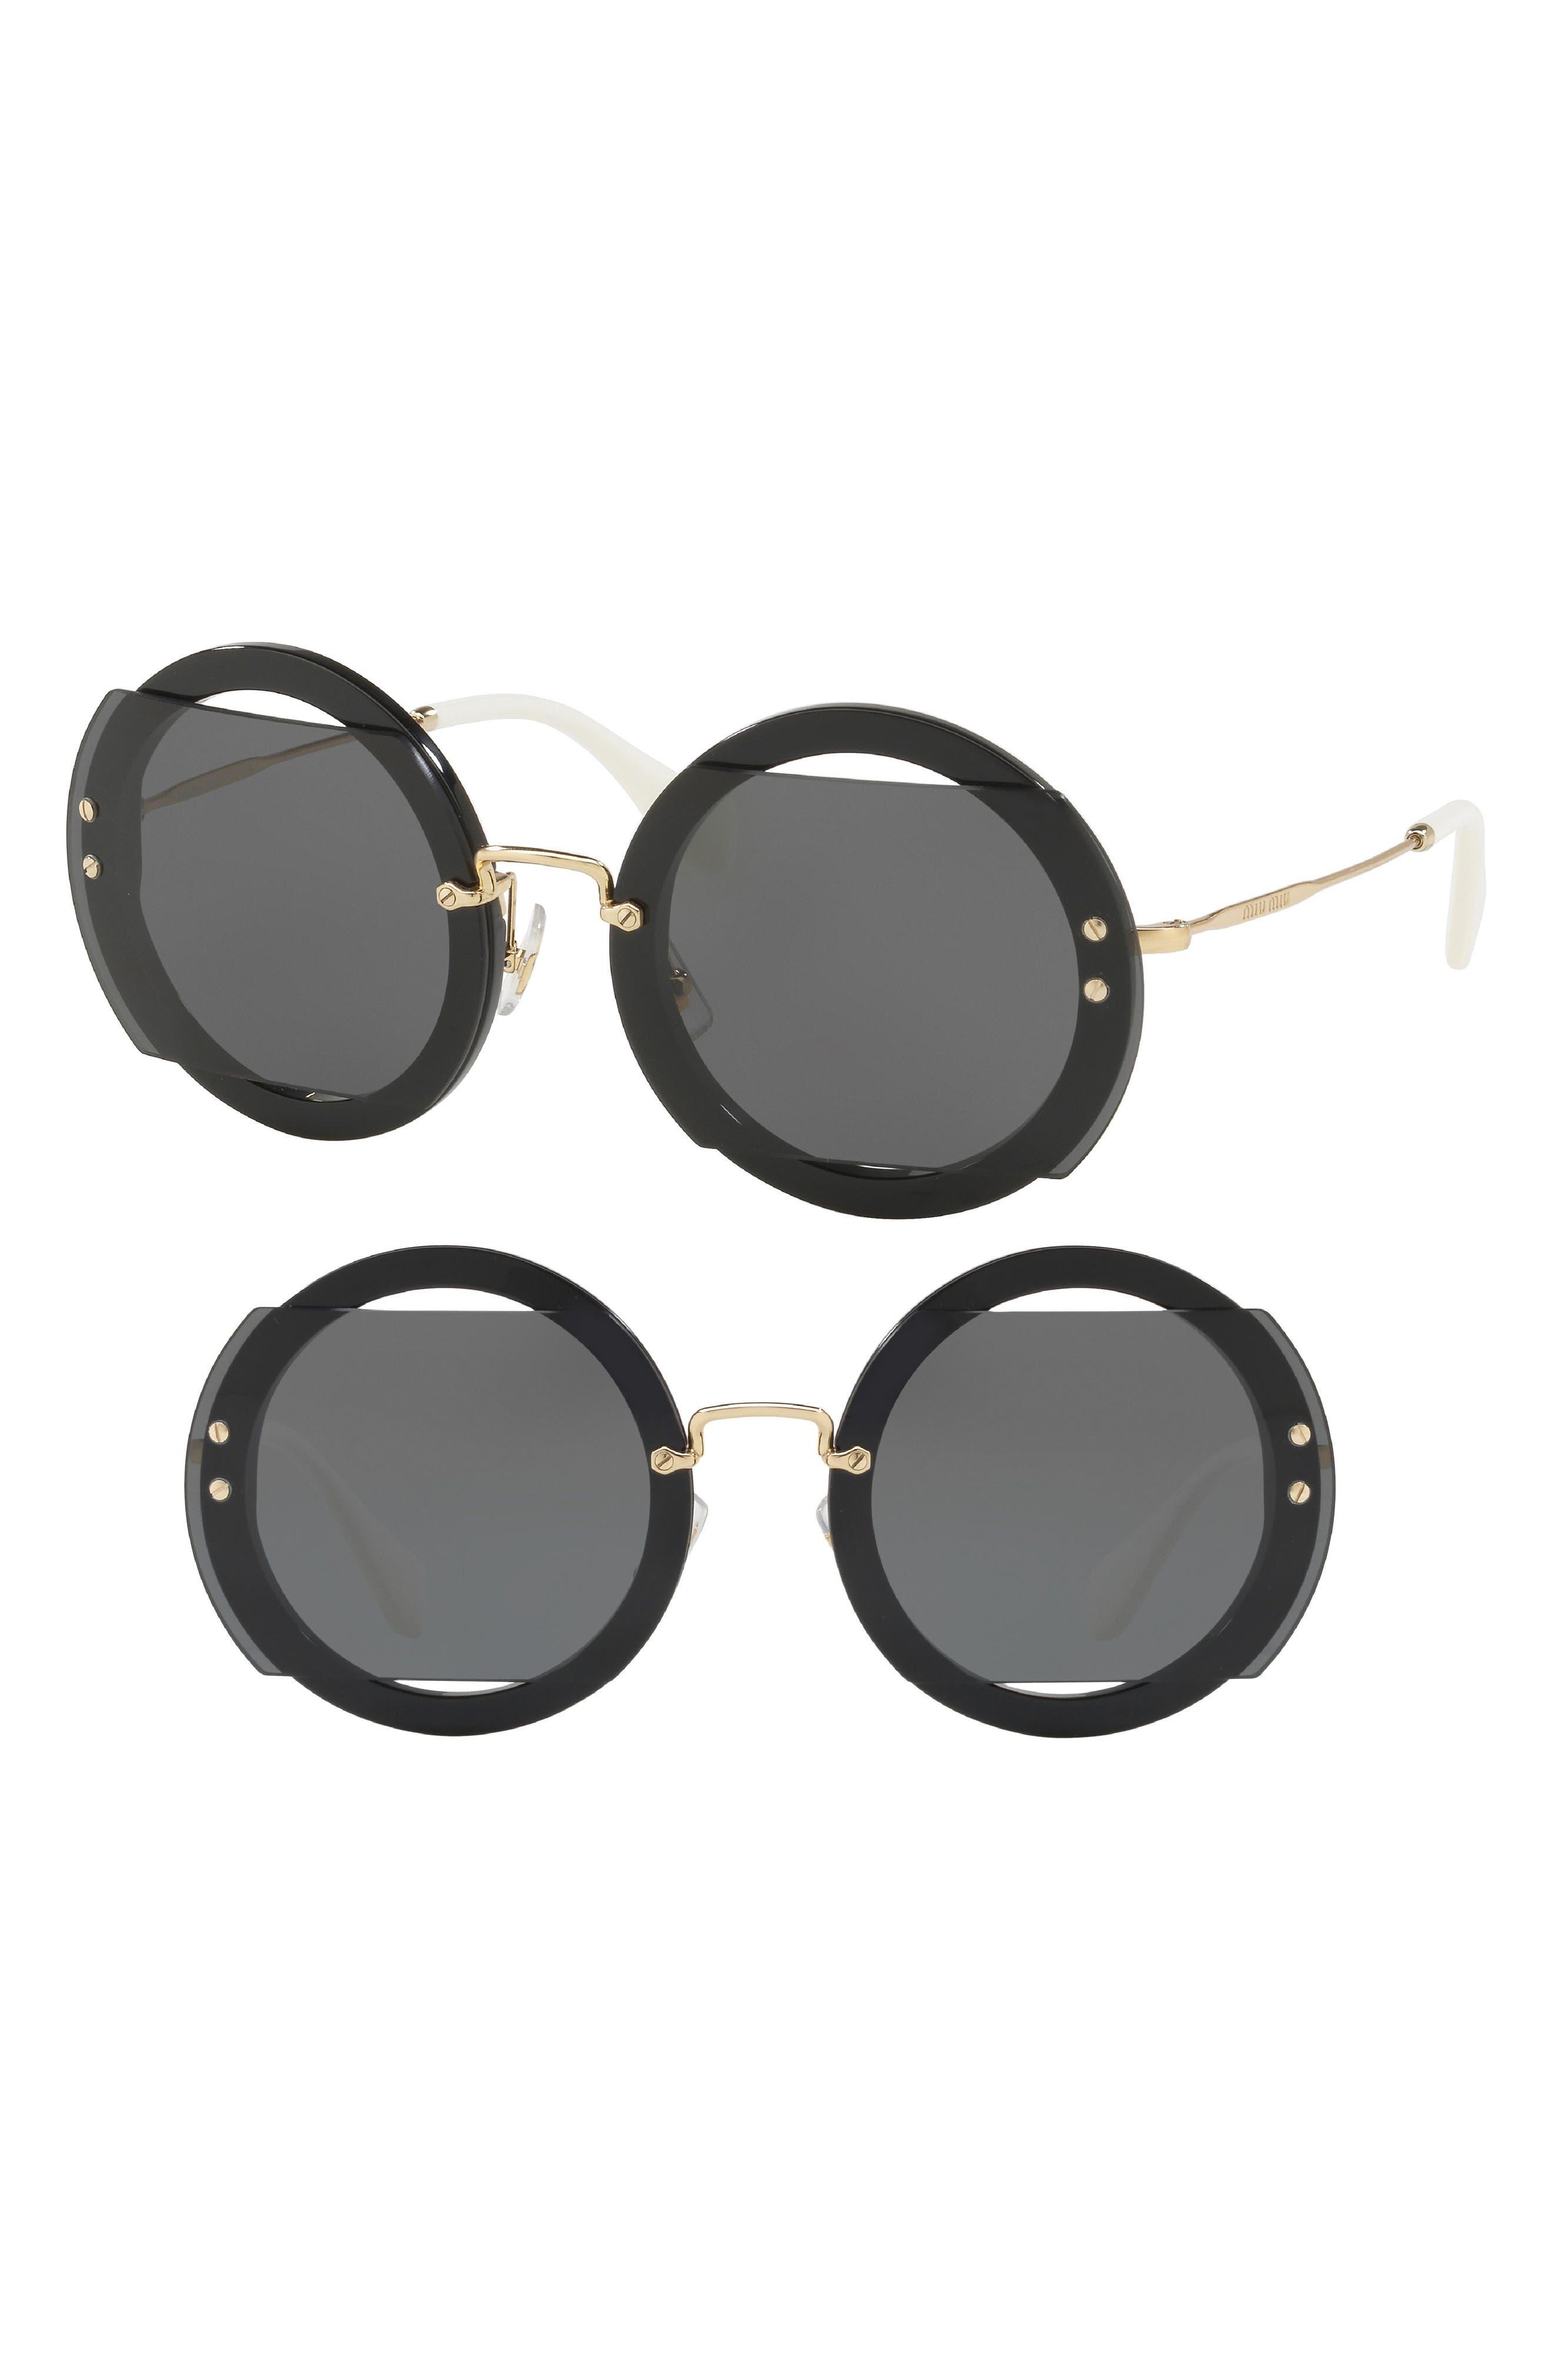 63mm Round Sunglasses,                             Main thumbnail 1, color,                             017